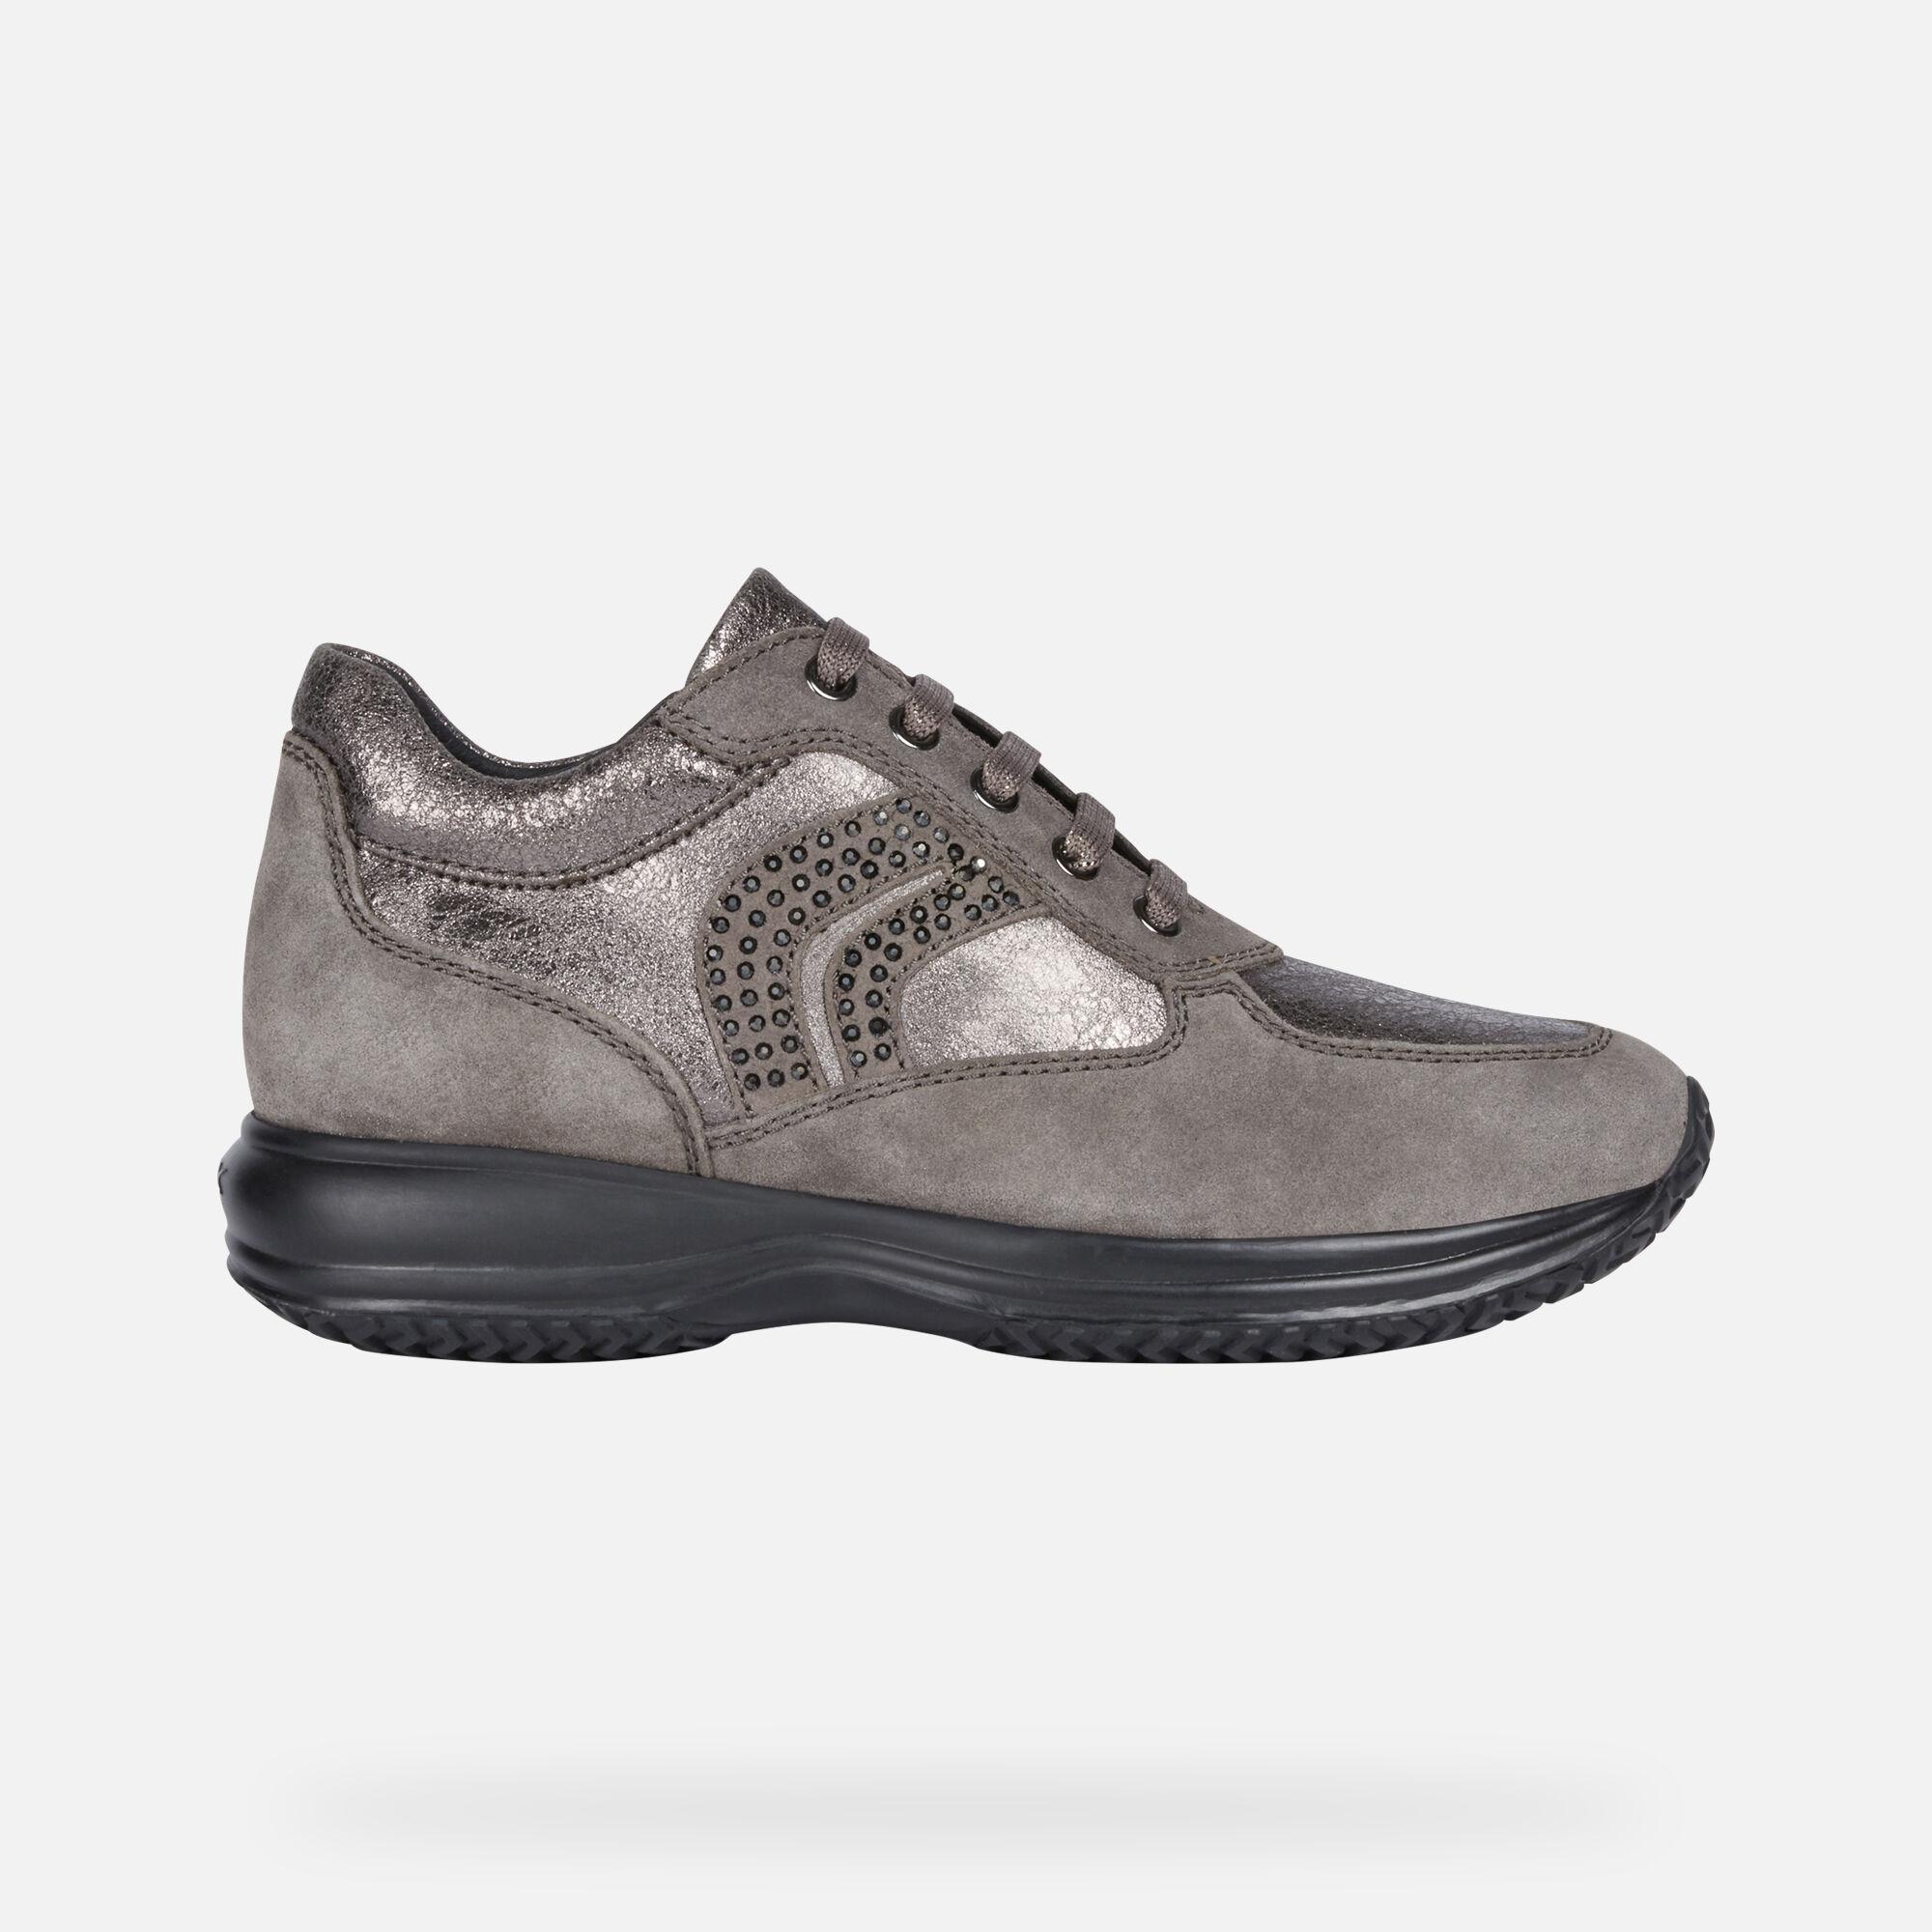 Sneakers Geox HAPPY | Brandsdistribution